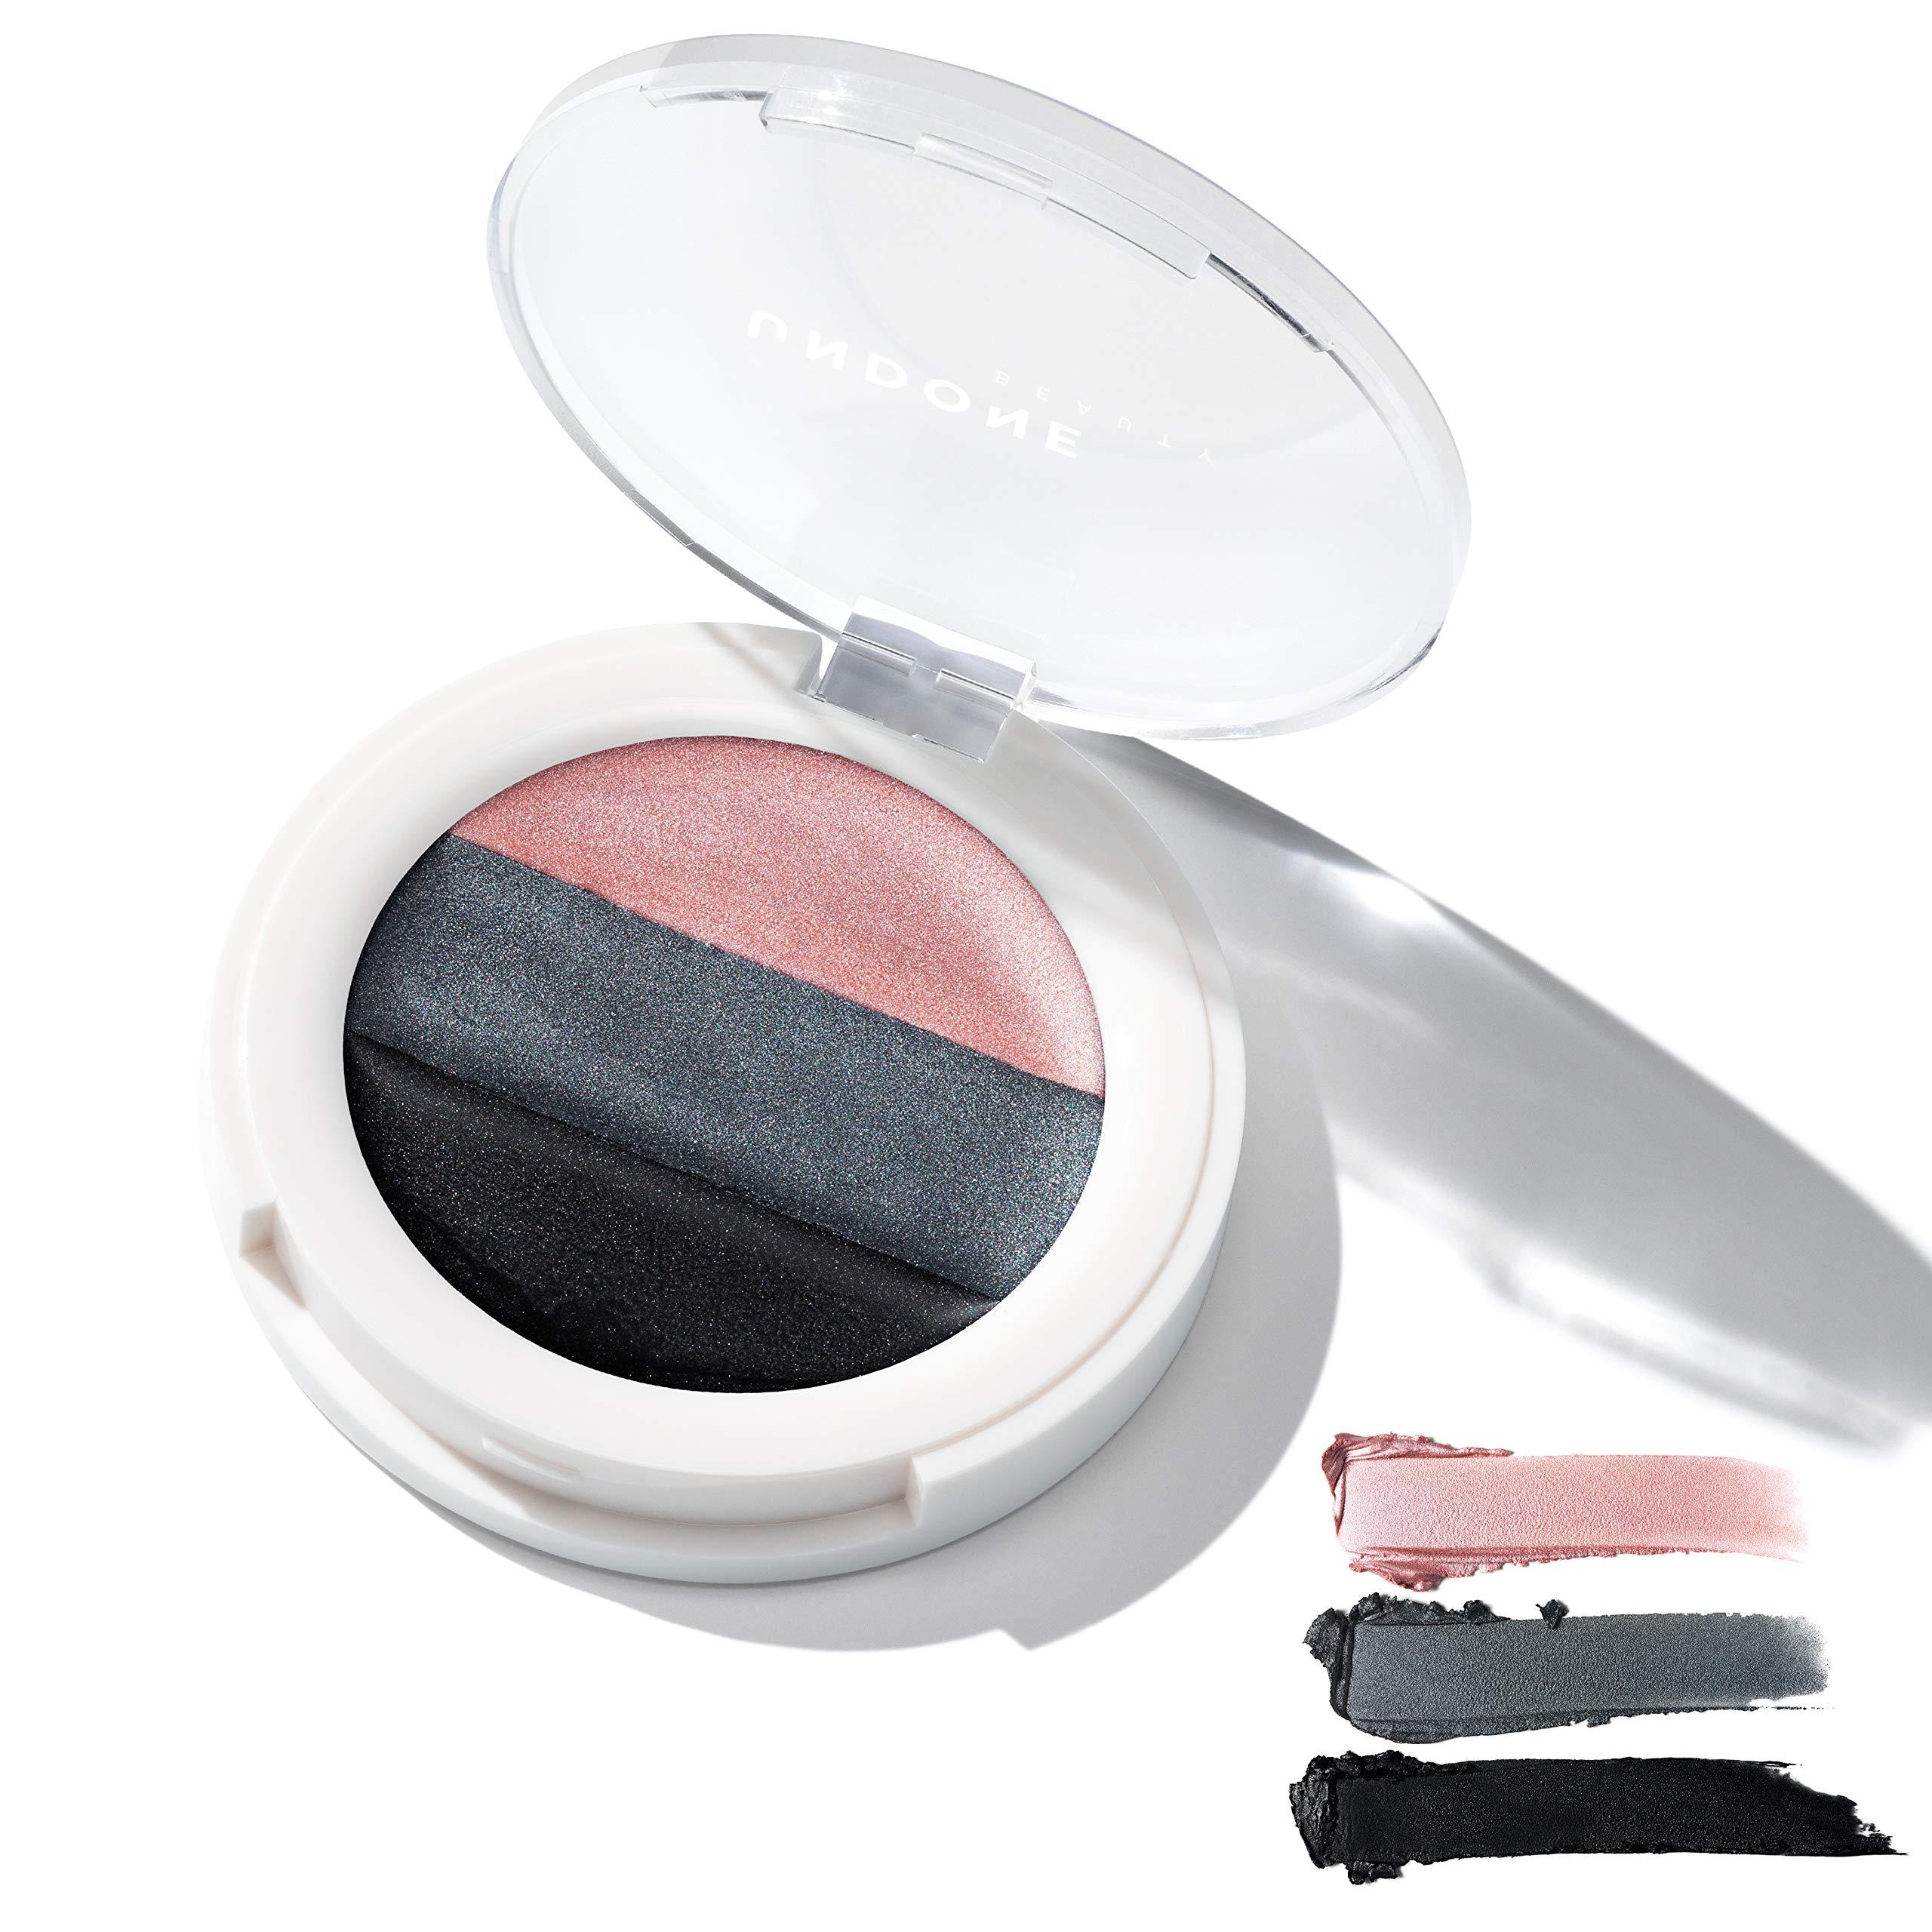 3-in-1 Cream Eye Palette. Highlighter/Primer, Eyeshadow & Liner. Castor Oil for Nourishing – UNDONE BEAUTY 3-in-1 Eye Palette. Long wear base, High Pigment Shadow & Liner. Smokey Eye. DOVETAIL